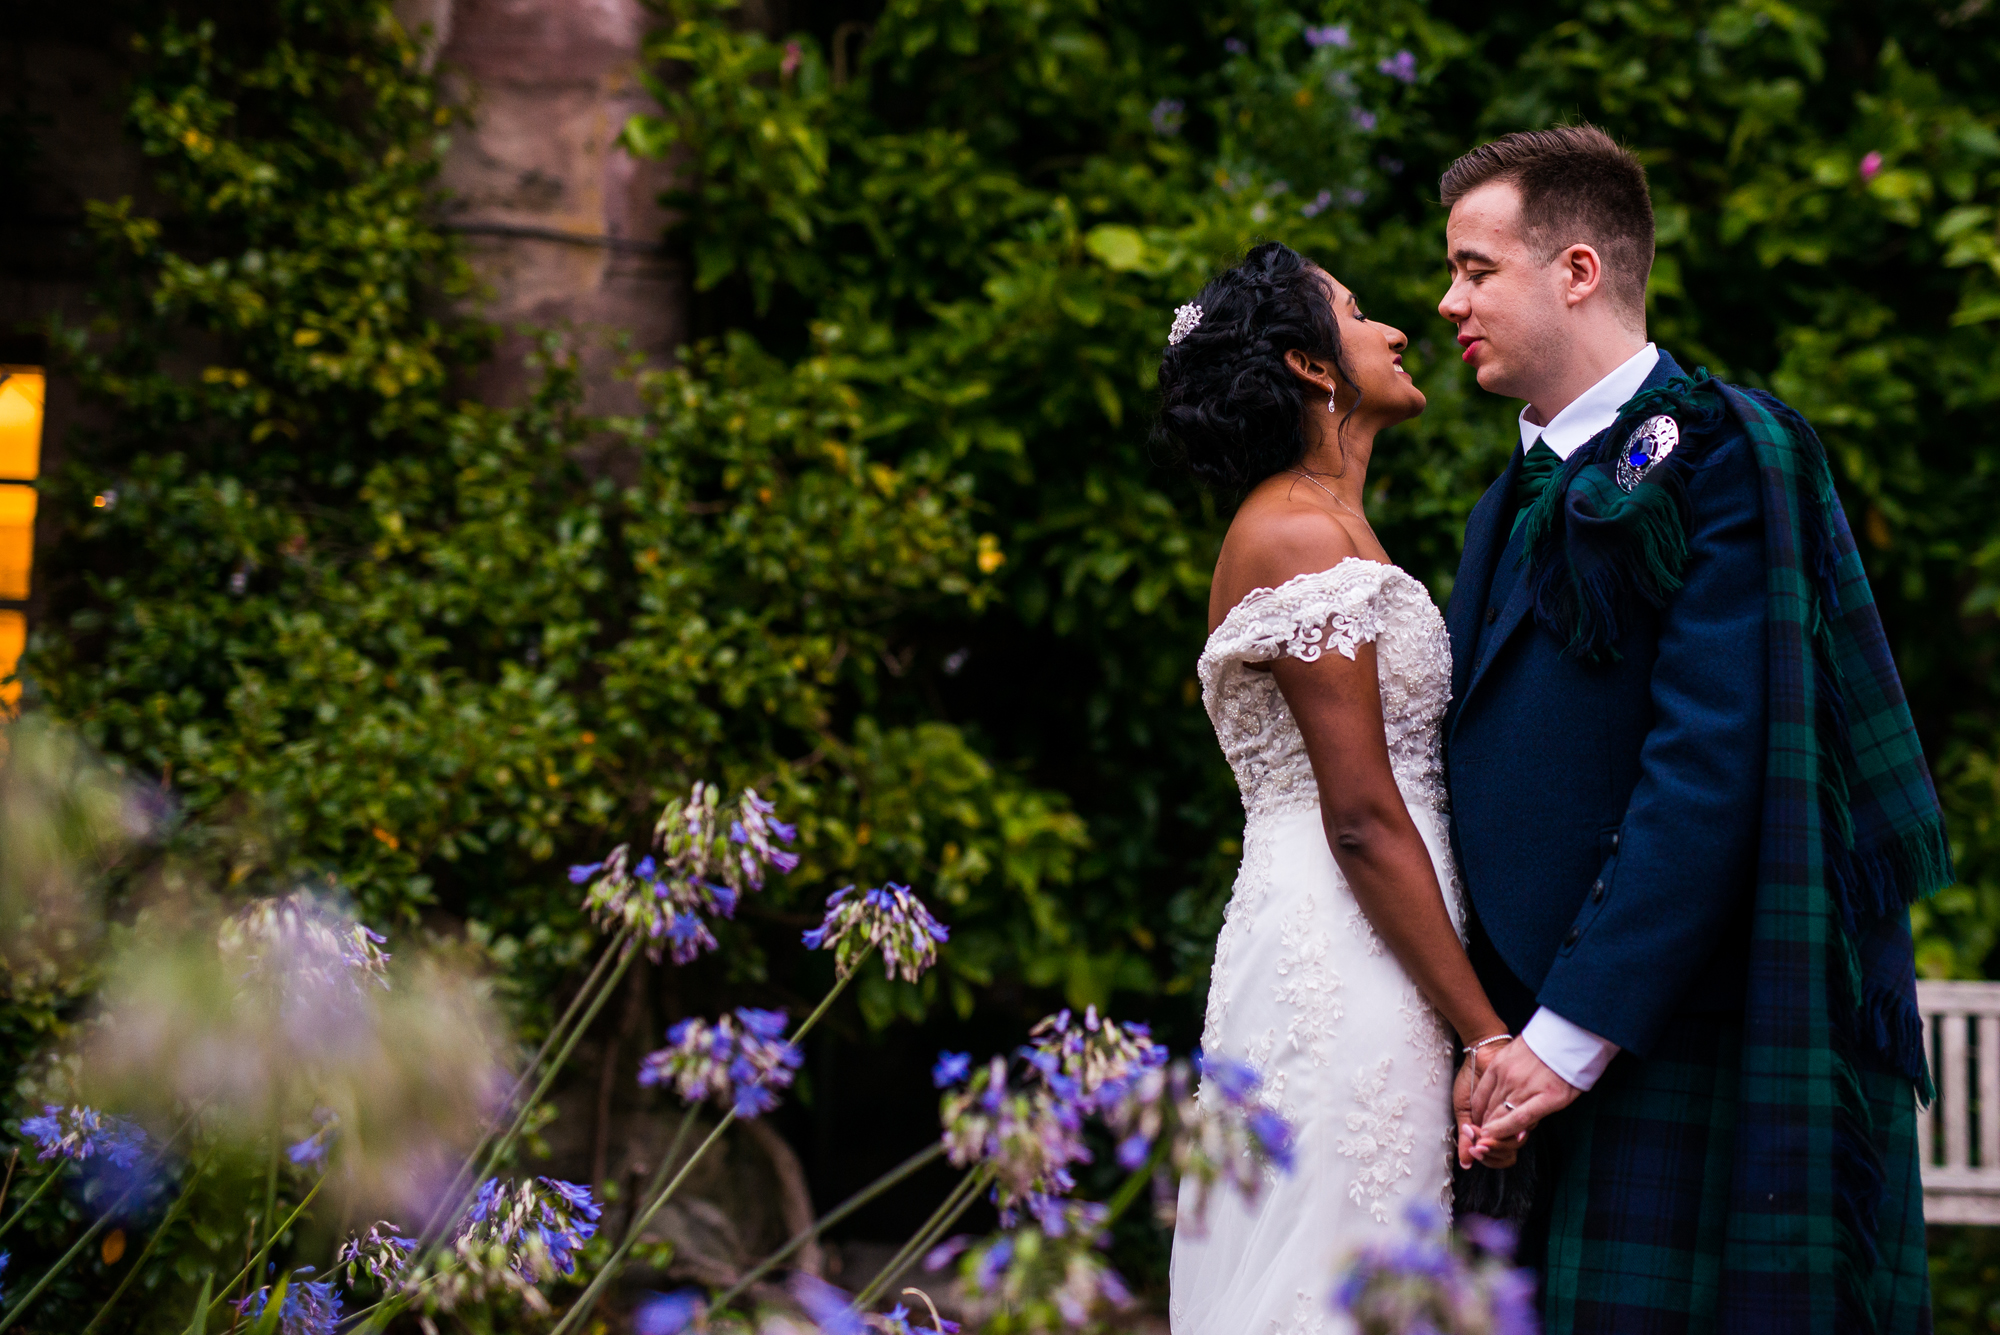 Kev and Shrabani wedding photos (310 of 350).jpg